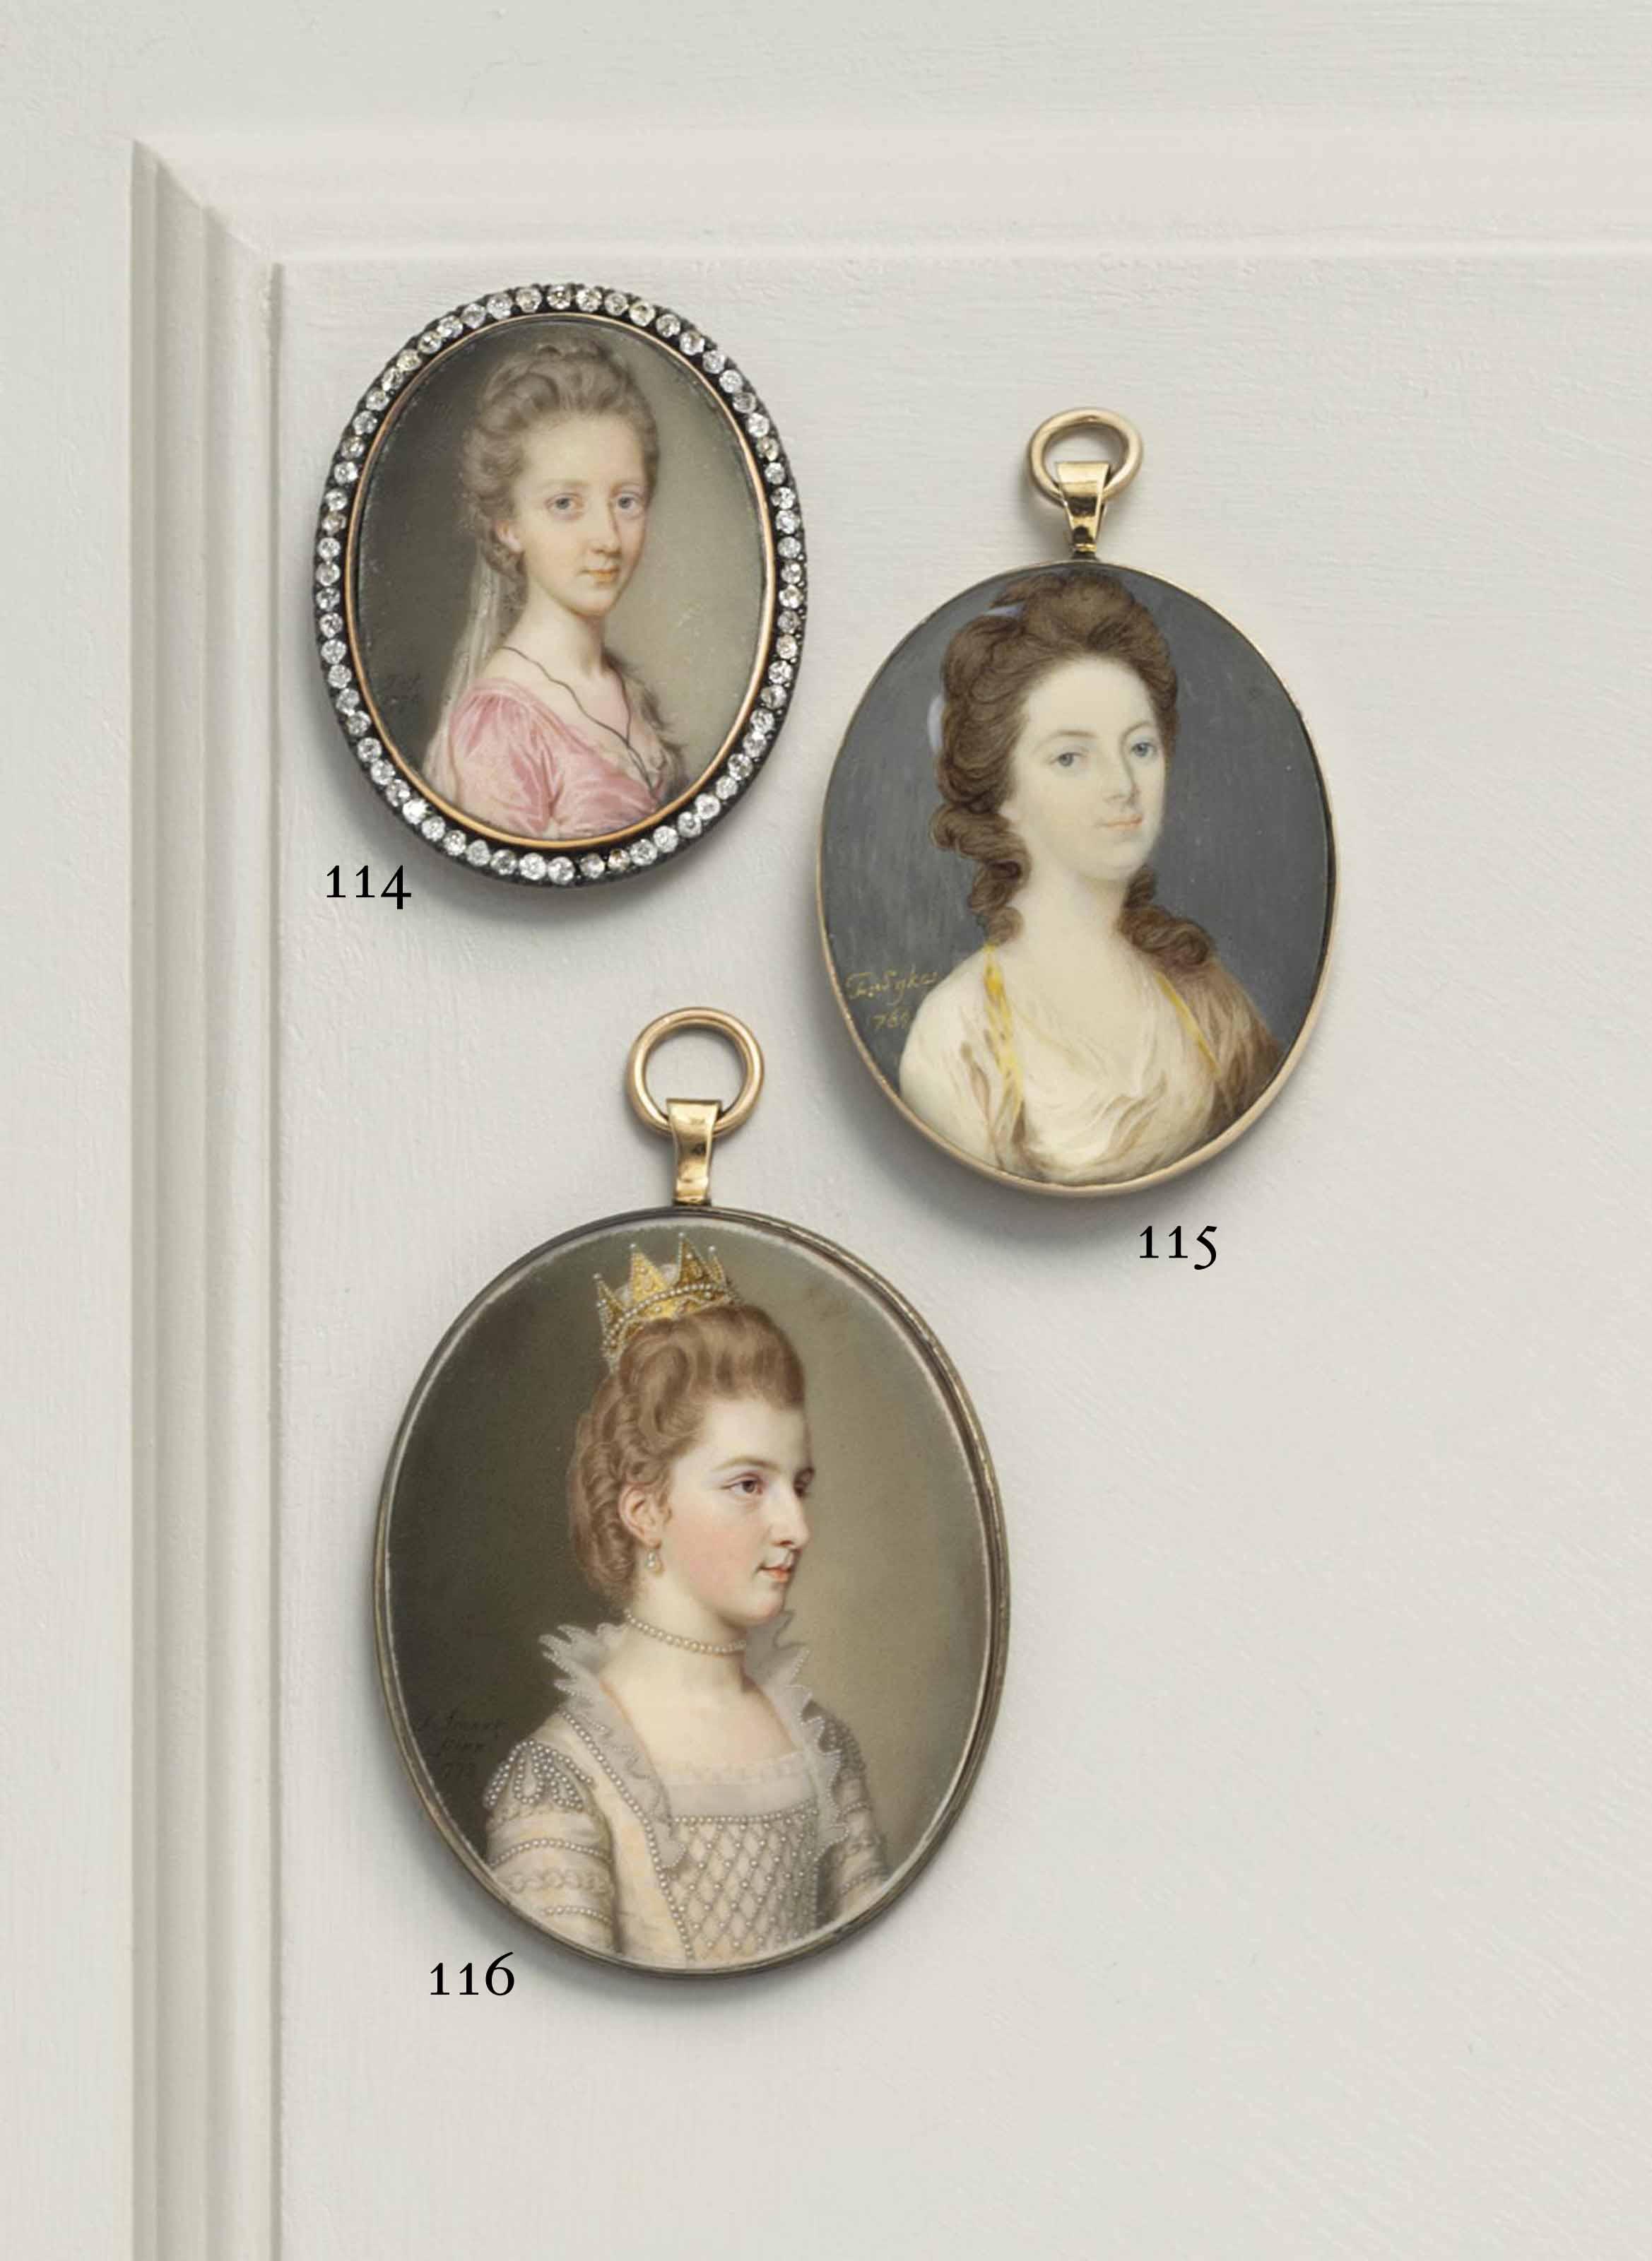 FRANCIS SYKES (BRITISH, FL. C. 1746 - 1763)